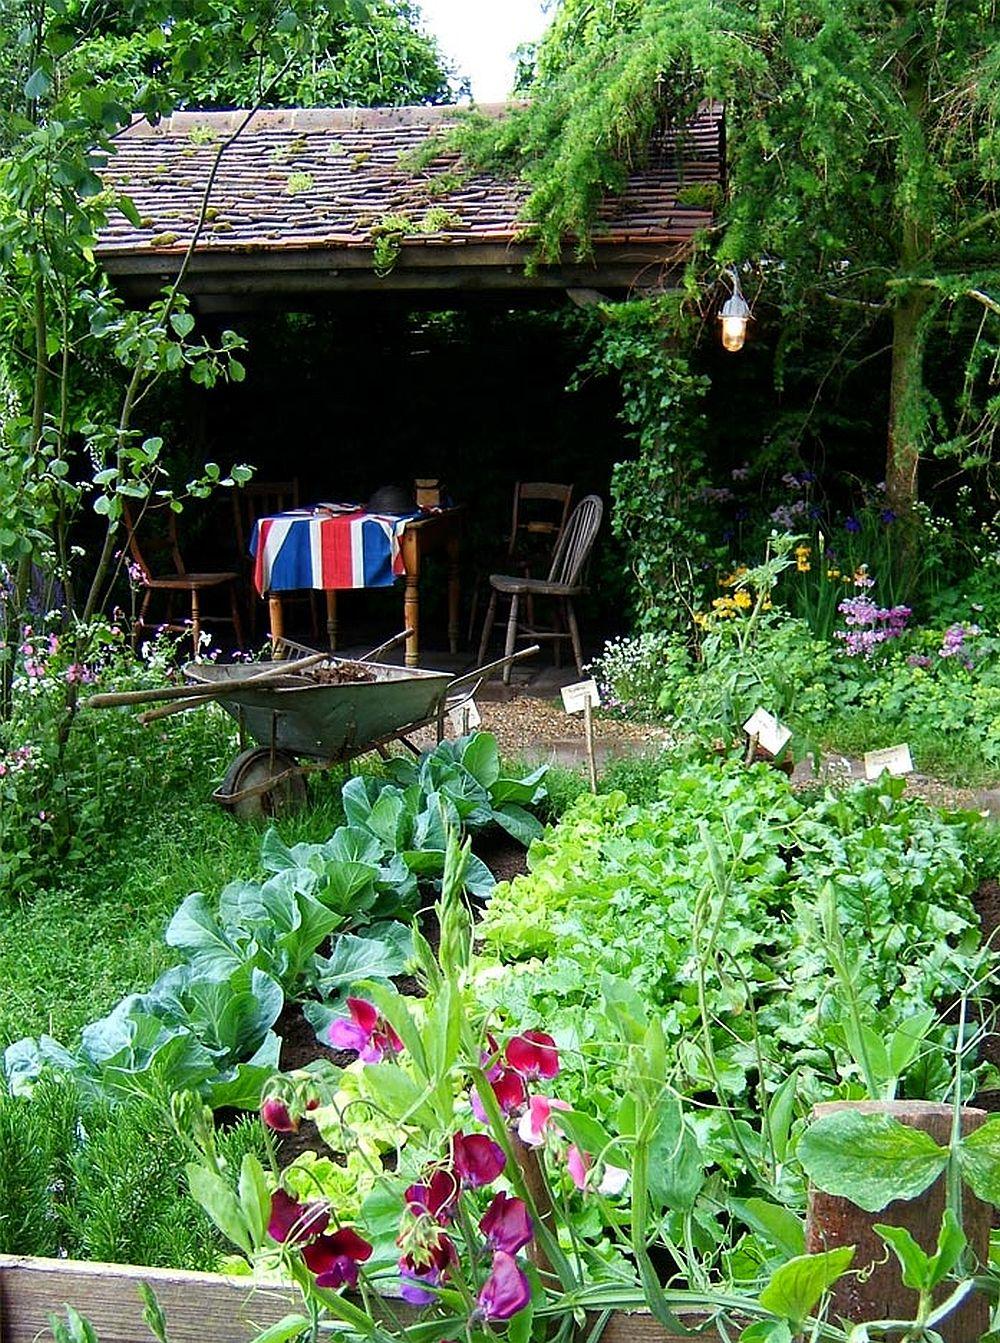 adelaparvu.com despre gradina rustica englezeasca, gradina Anglia, gradina Chelsea Pensioners Garden, designer peisagist Julian Dowle, Foto blog MooseysCountryGarden (22)